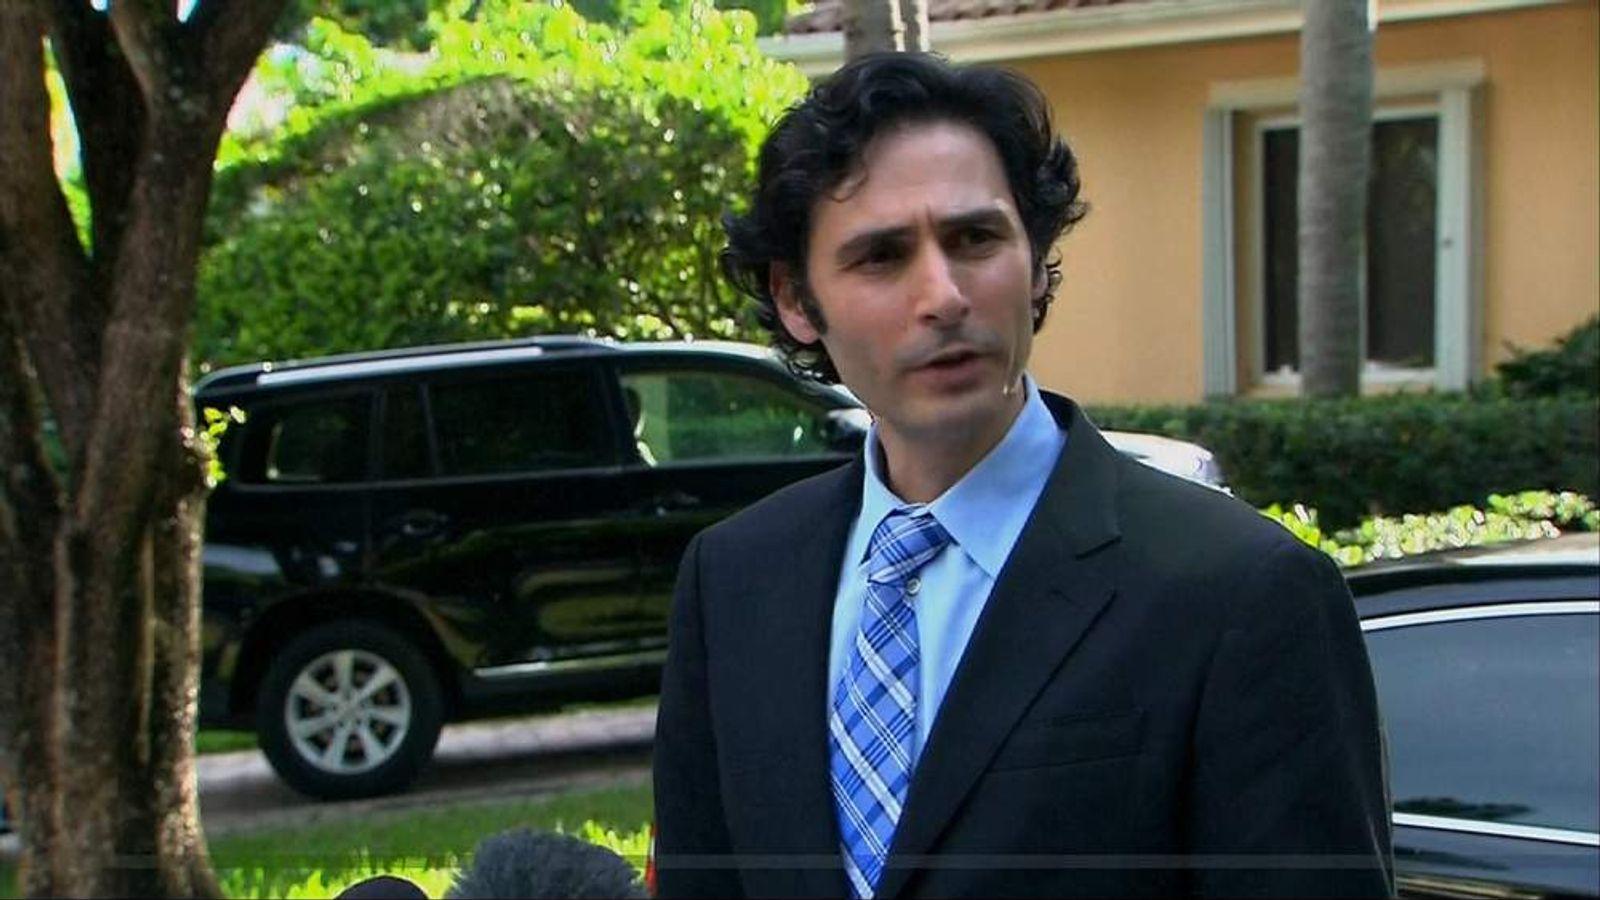 Spokesman for Sotloff family